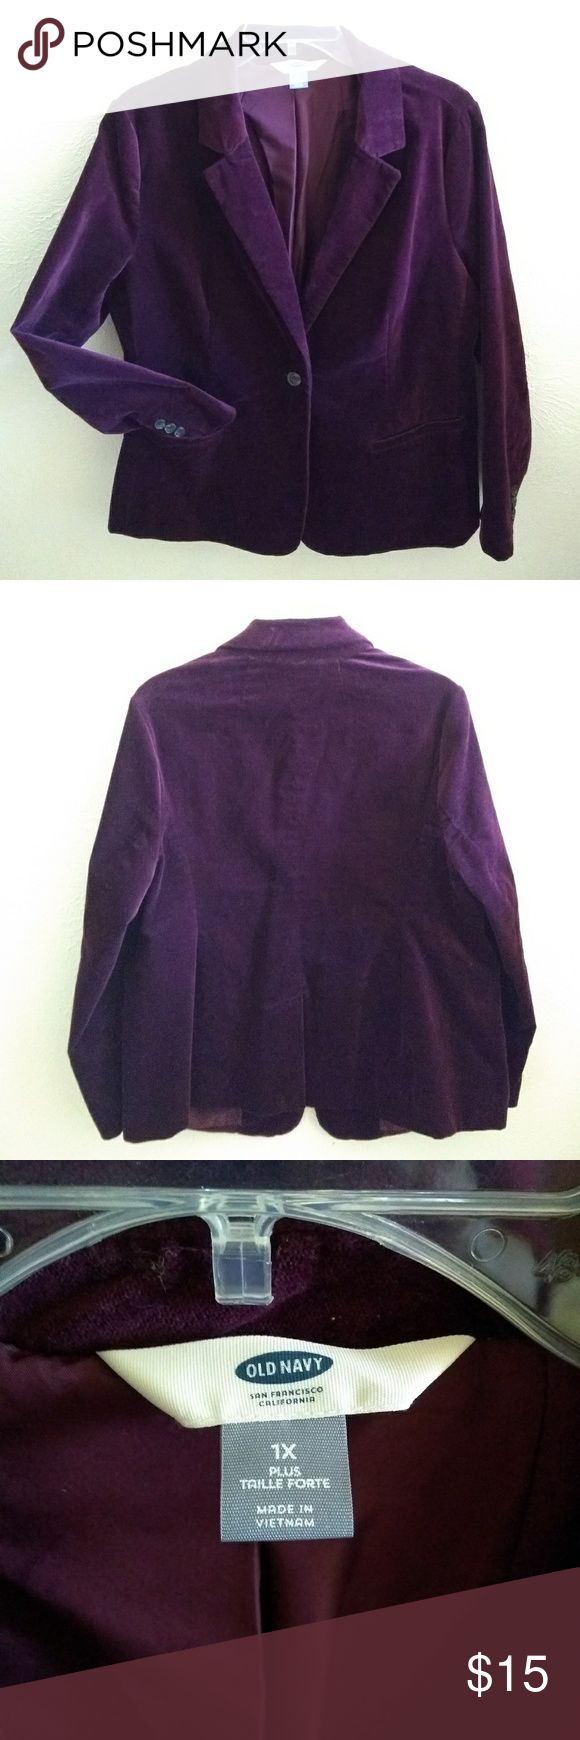 Spotted while shopping on Poshmark: Old Navy Velvet Plum Fitted Blazer! #poshmark #fashion #shopping #style #Old Navy #Jackets & Blazers